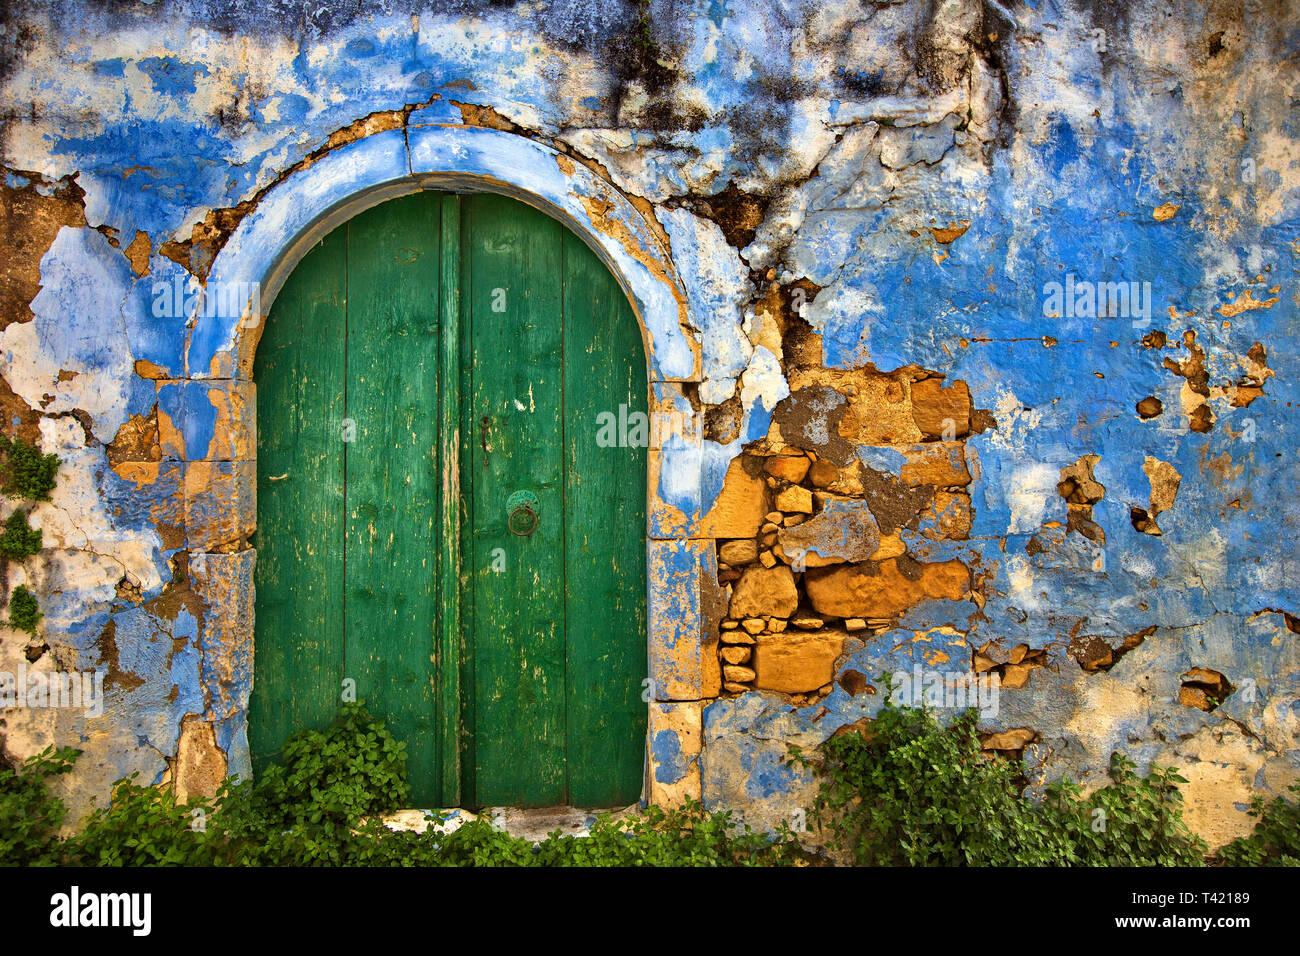 Old door at Margarites village, Mylopotamos county, Rethymno, Crete, Greece. Margarites village is famous for its ceramics art workshops. - Stock Image